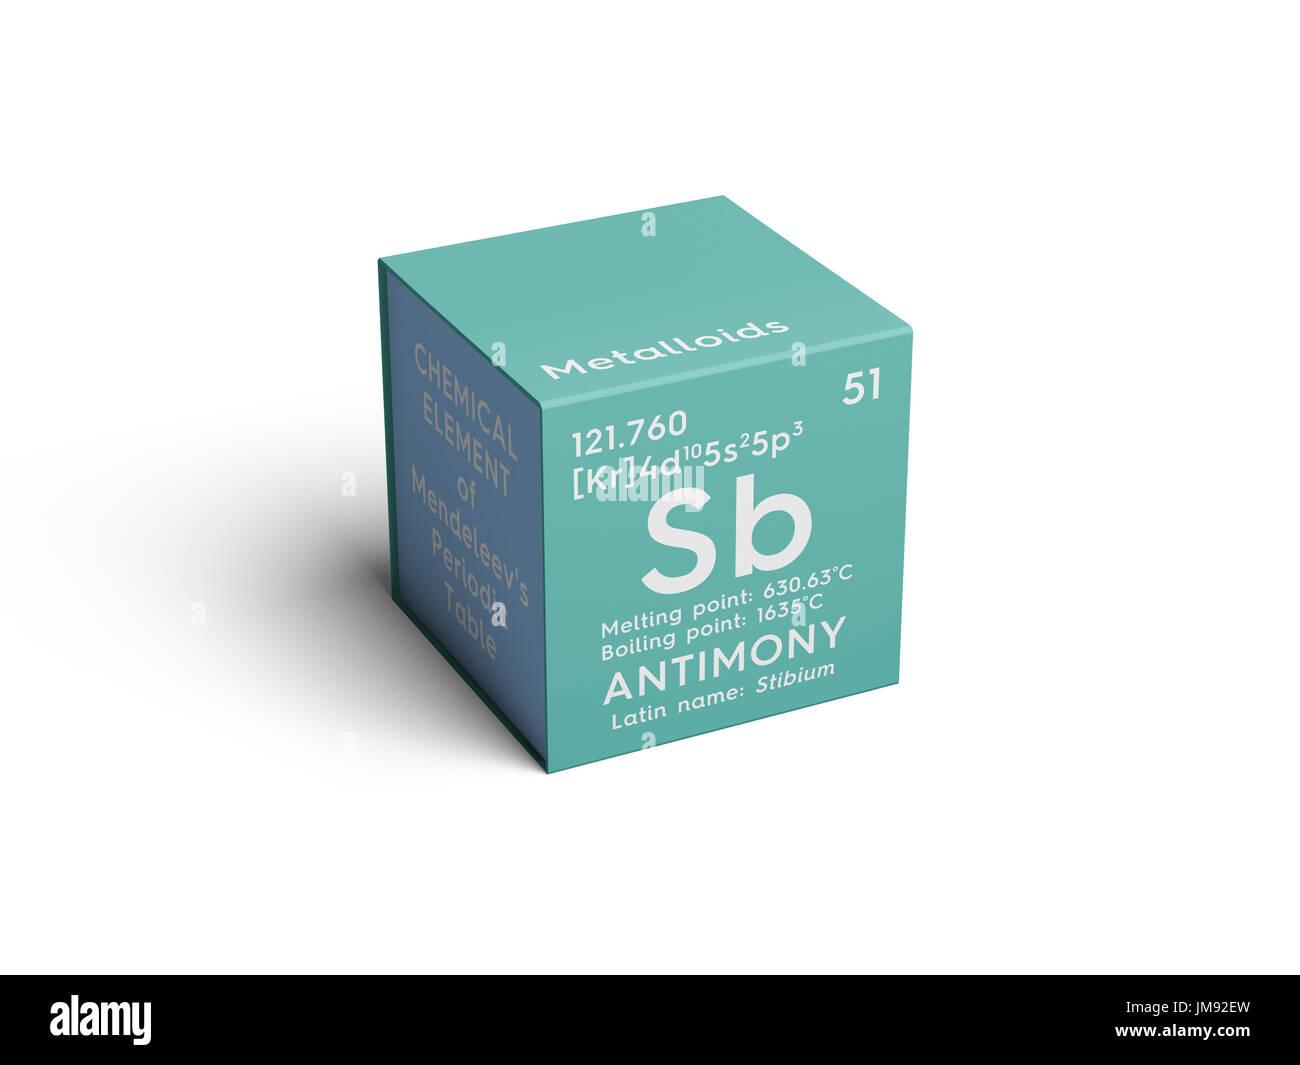 Antimony stibium metalloids chemical element of mendeleevs antimony stibium metalloids chemical element of mendeleevs periodic table antimony in square gamestrikefo Choice Image